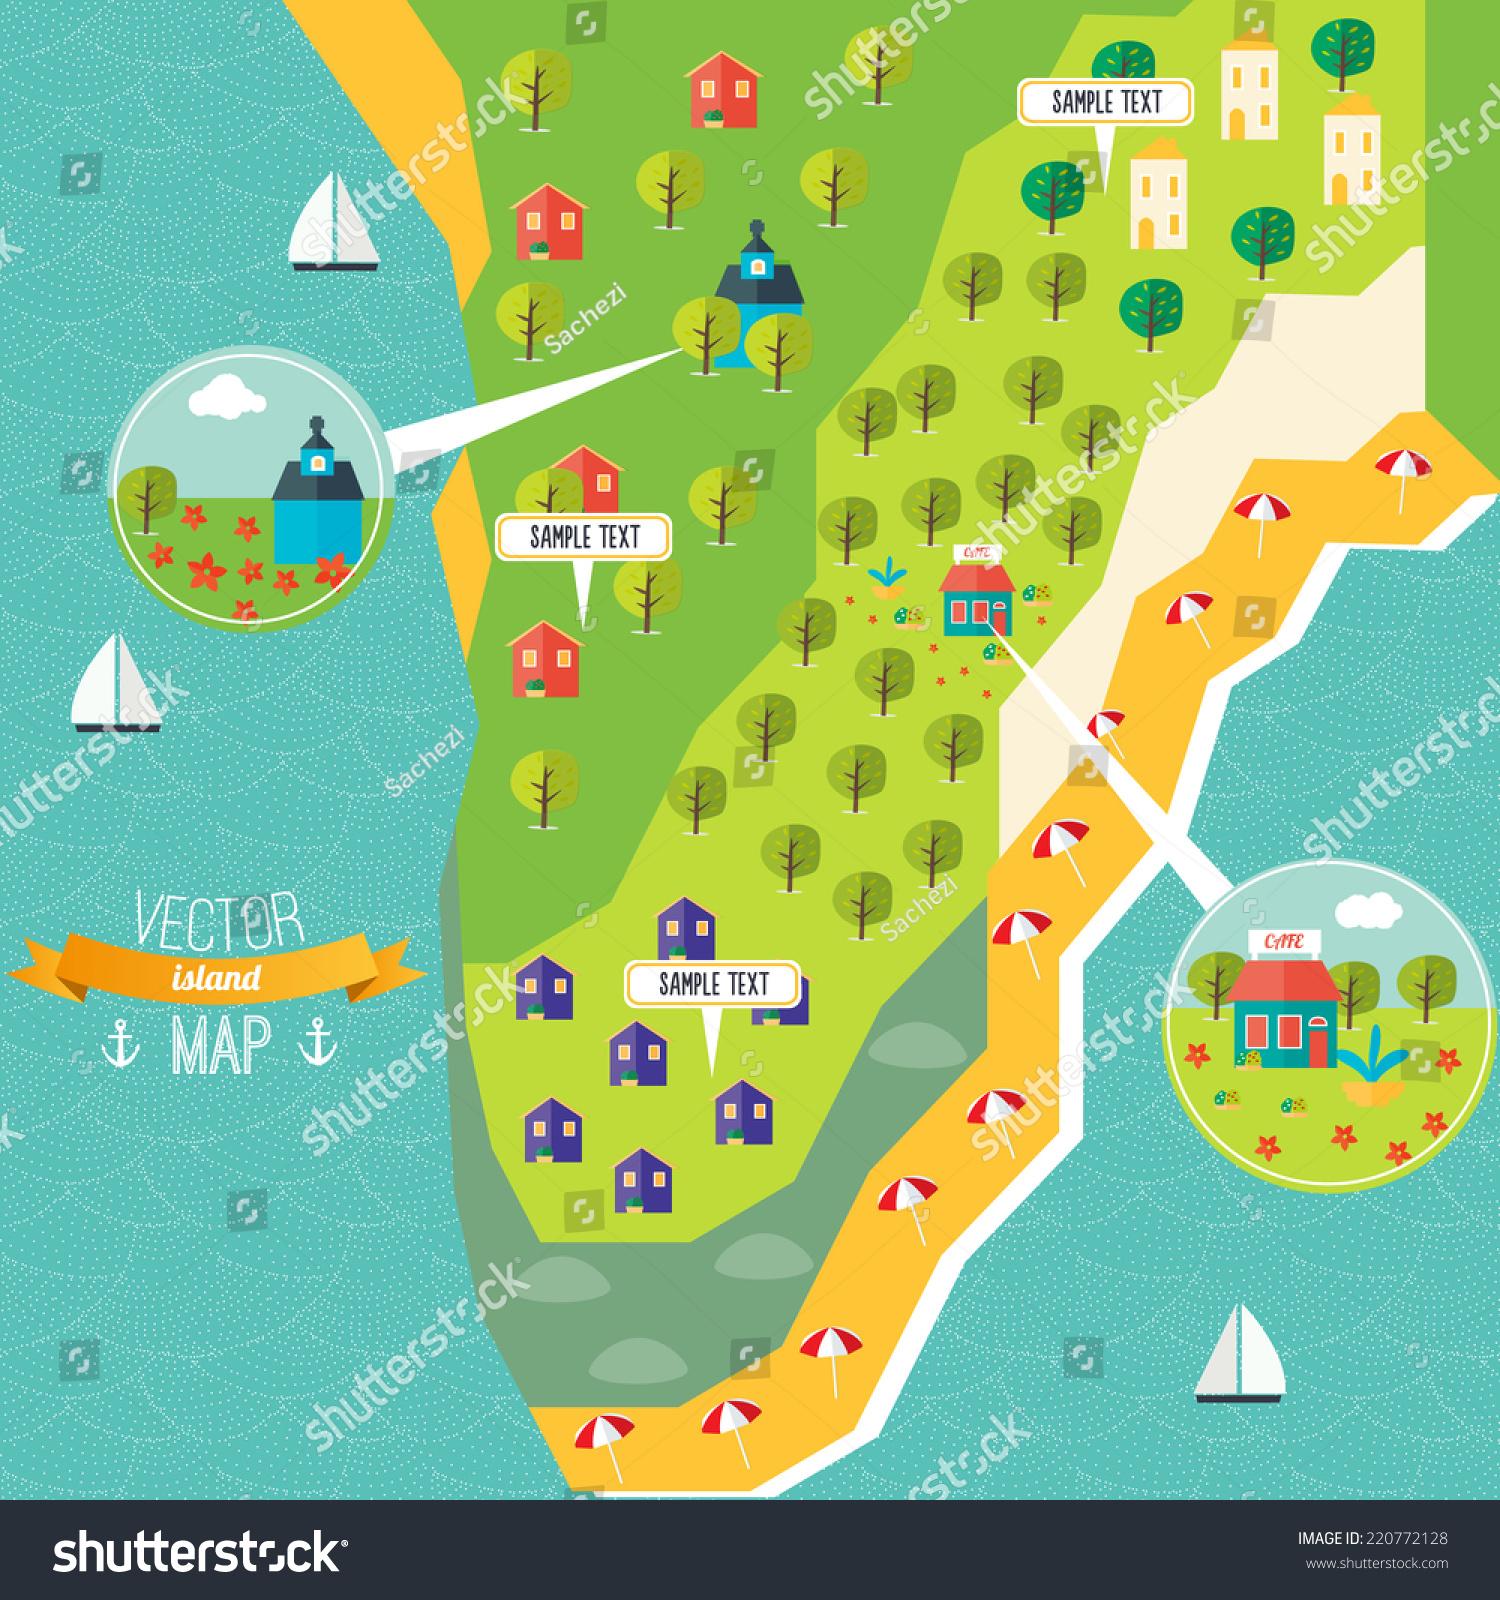 Flat Vector Map Design Stock Vector 220772128 - Shutterstock